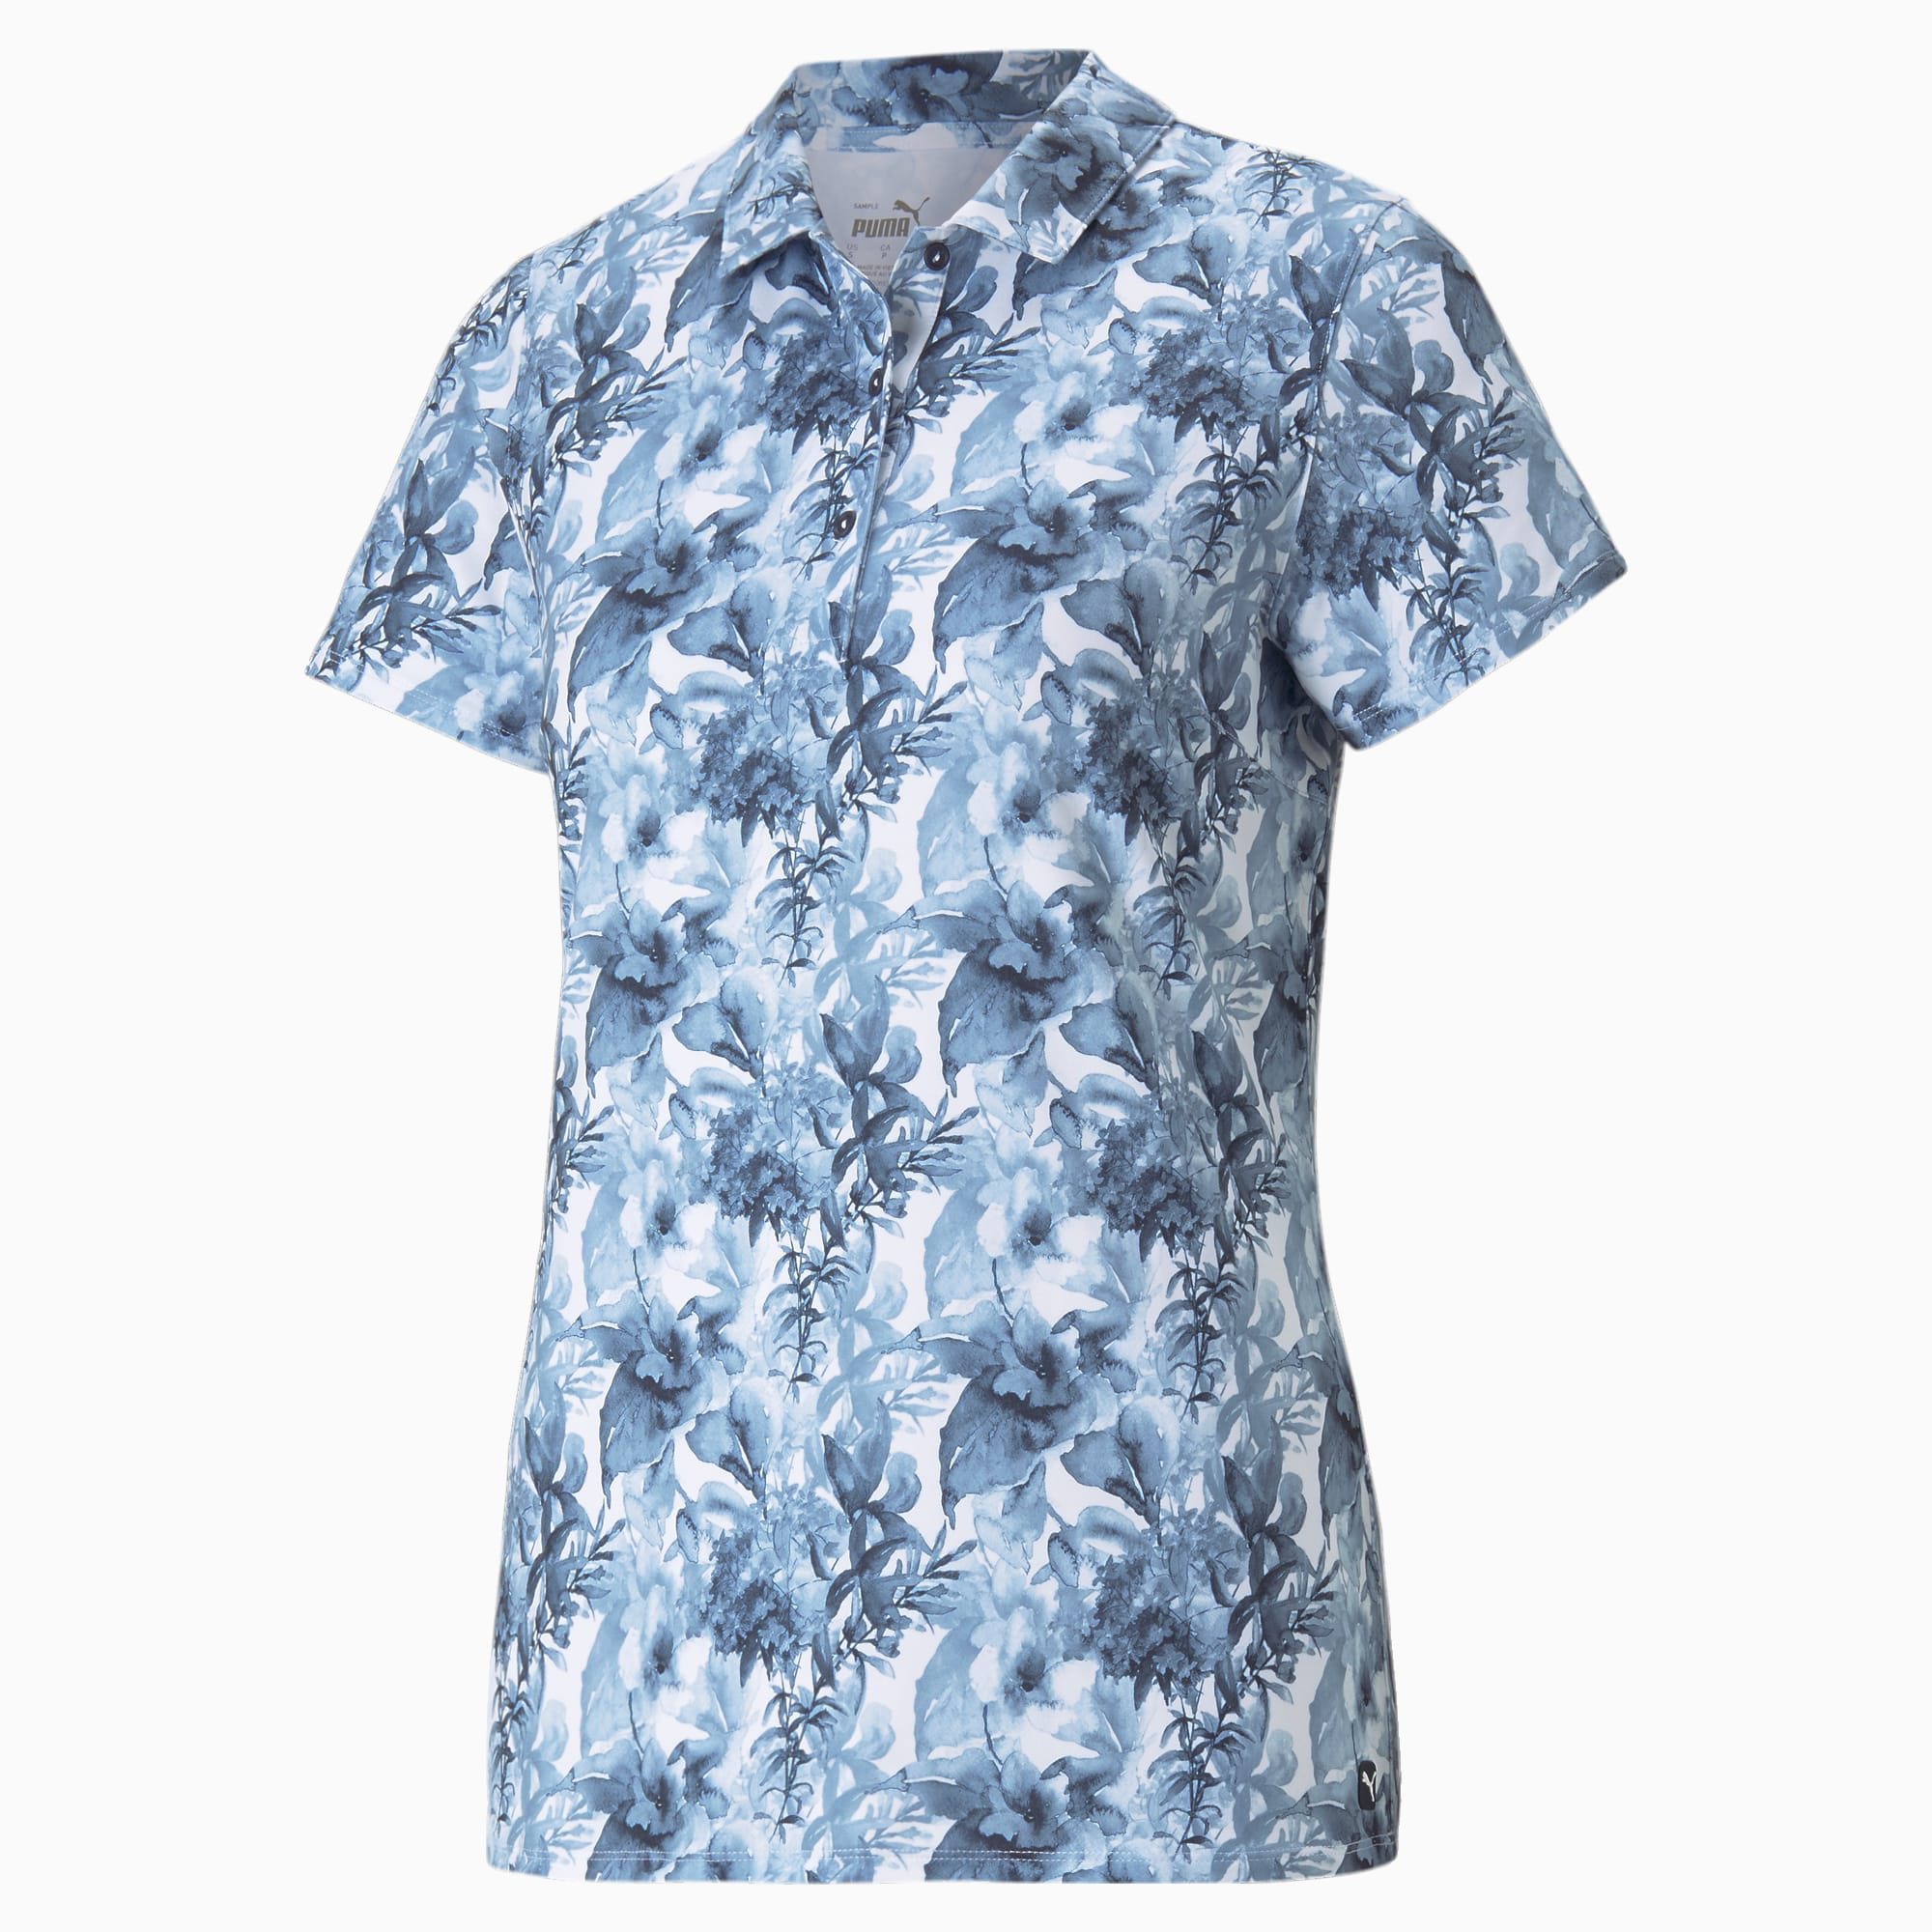 Polo Cloudspun Tropical , Bleu, Taille L, Vêtements - PUMA - Modalova